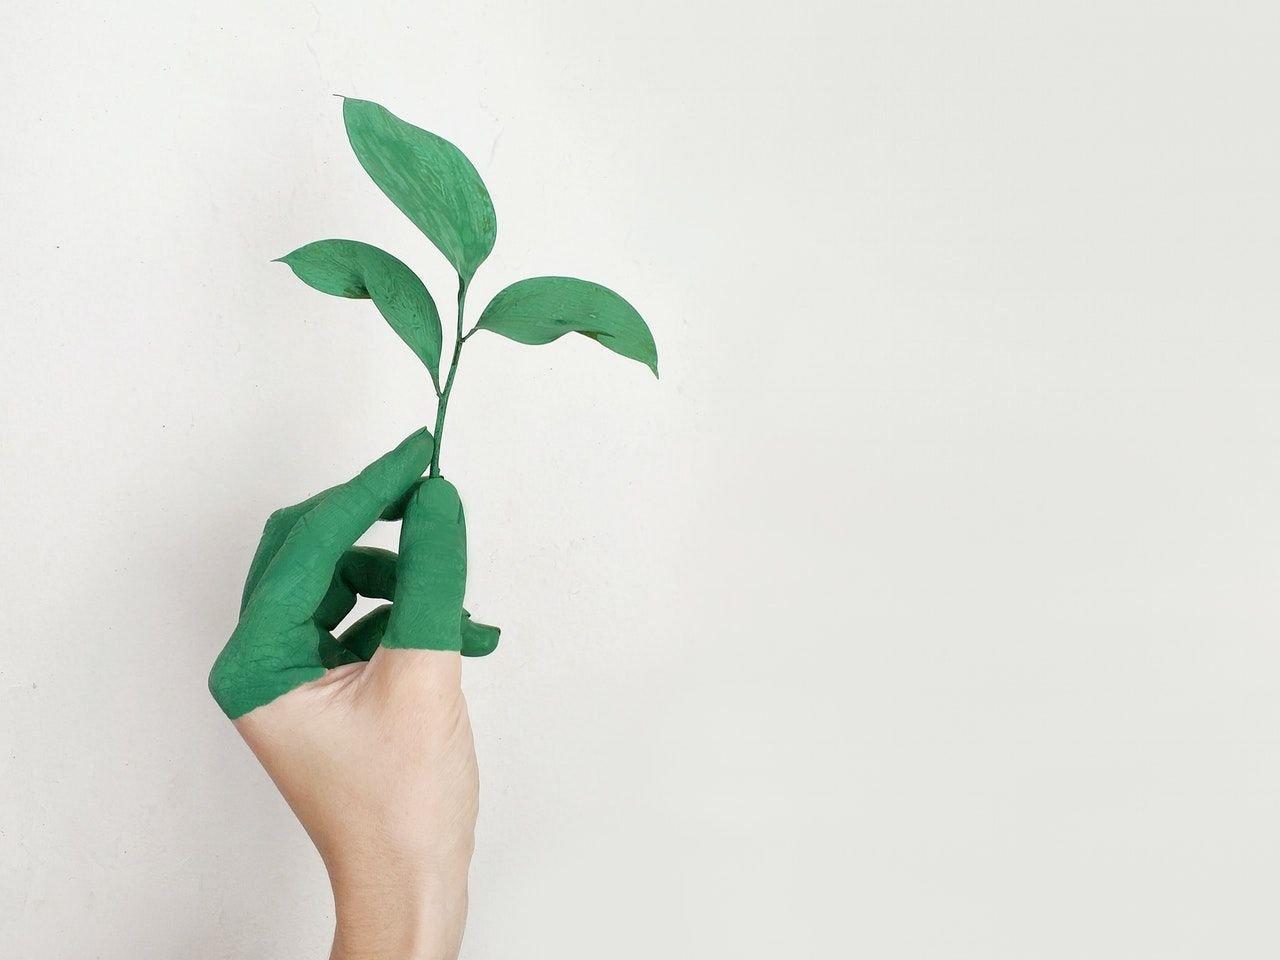 eco friendly prego e martelo